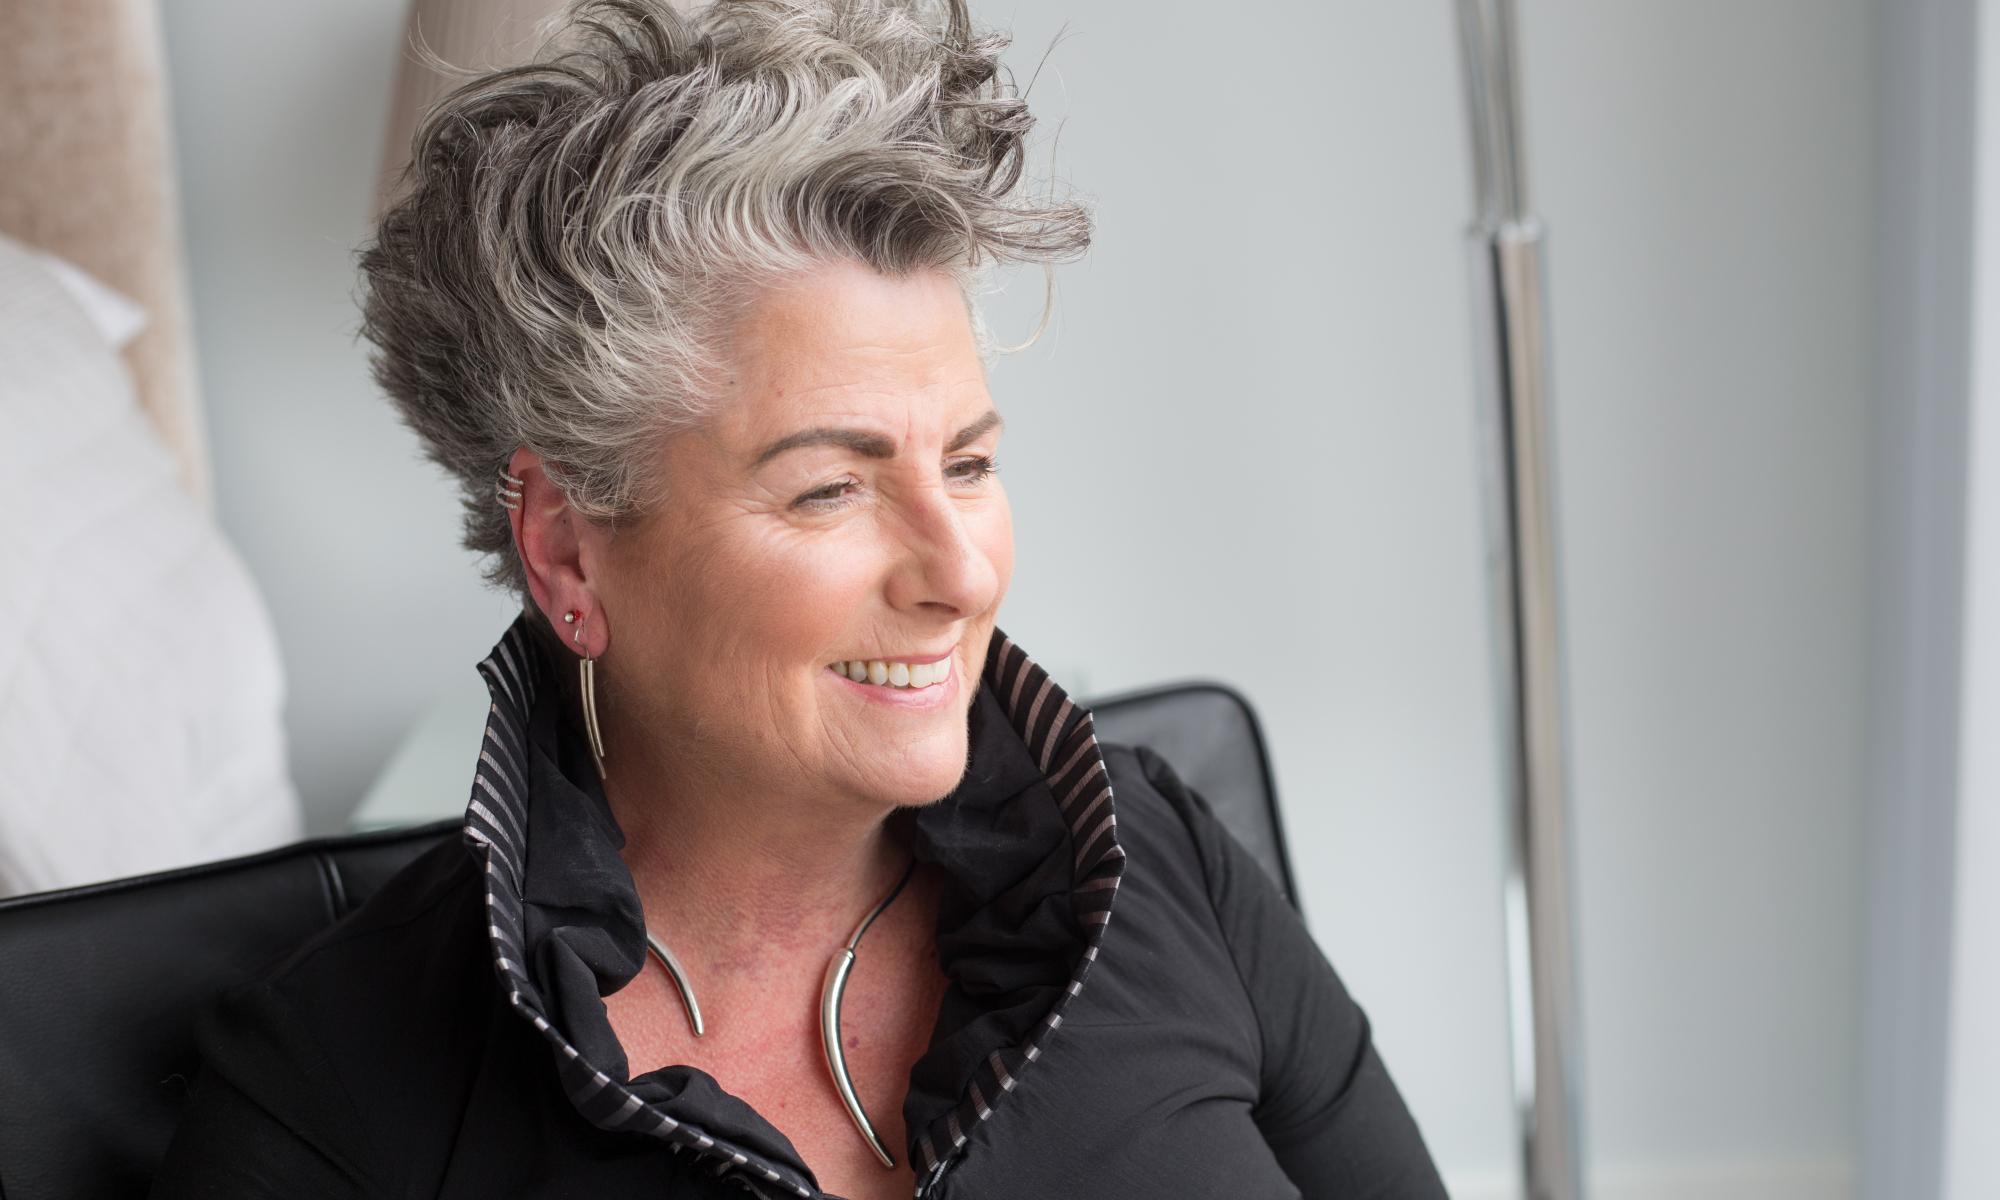 Laceby female entrepreneur